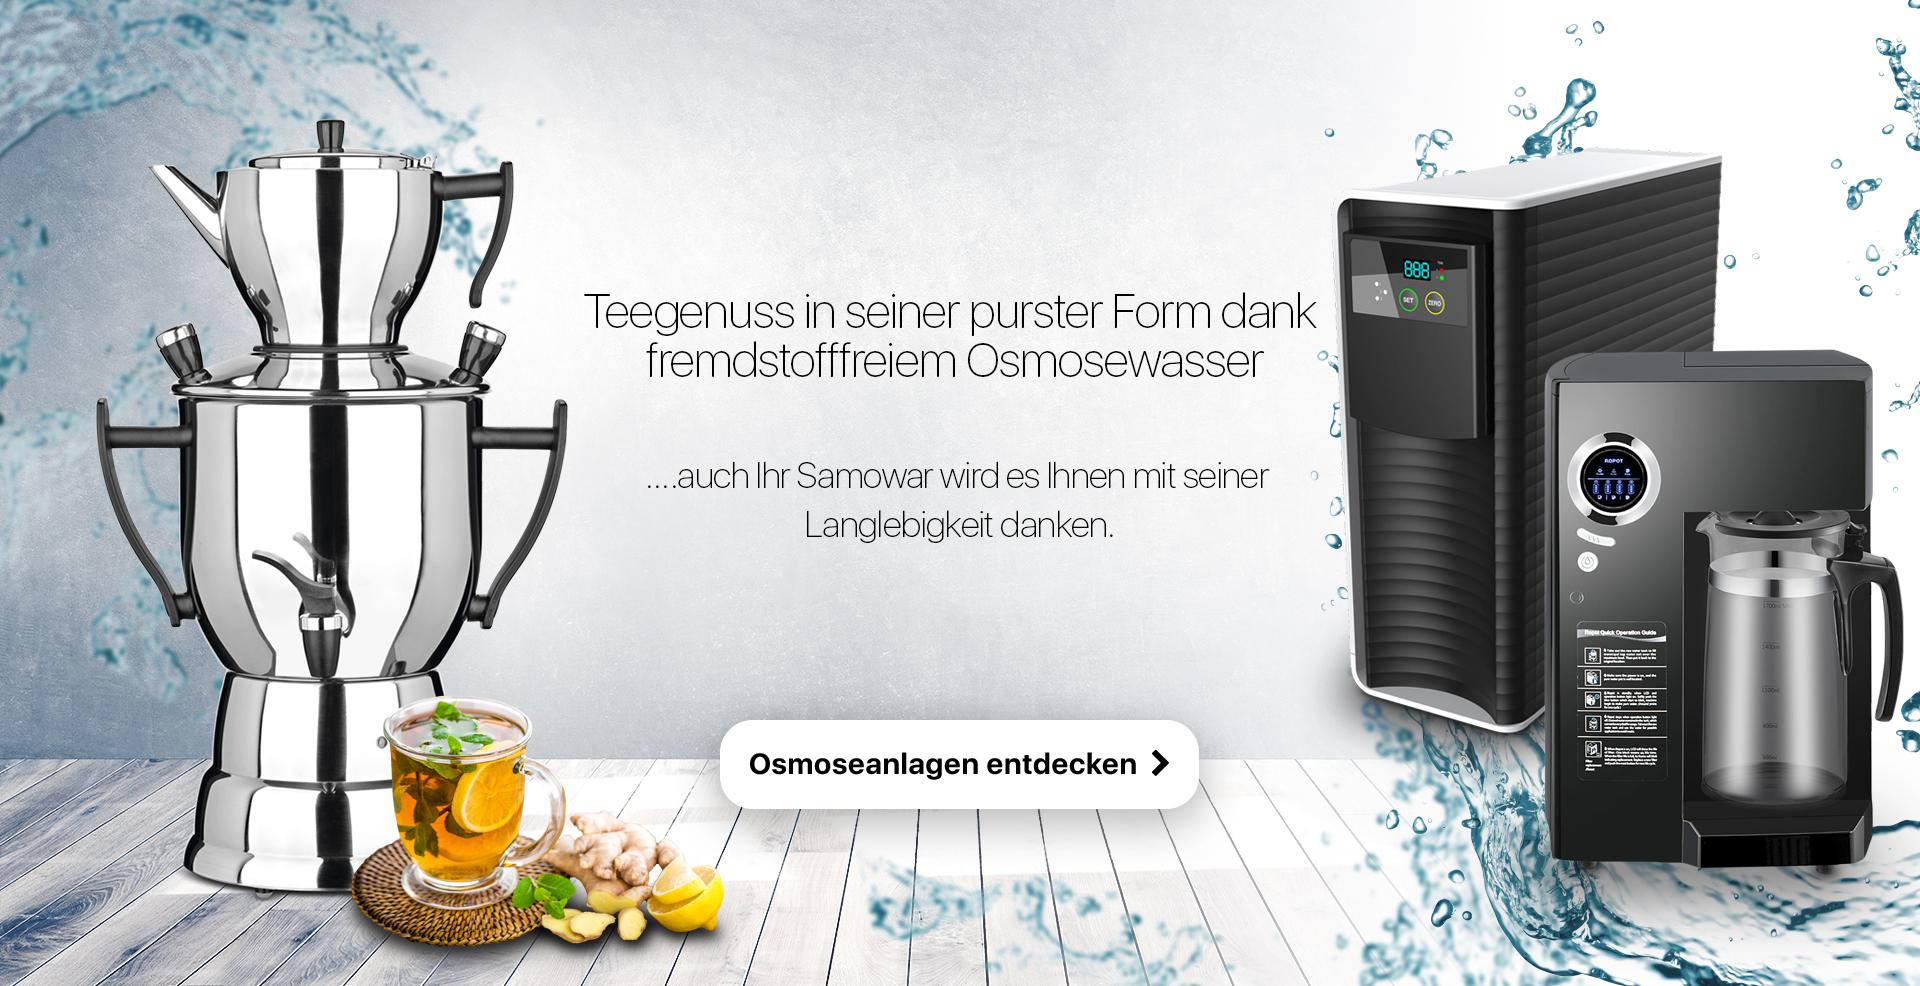 Osmosewasser_ohne-Samoware_07123